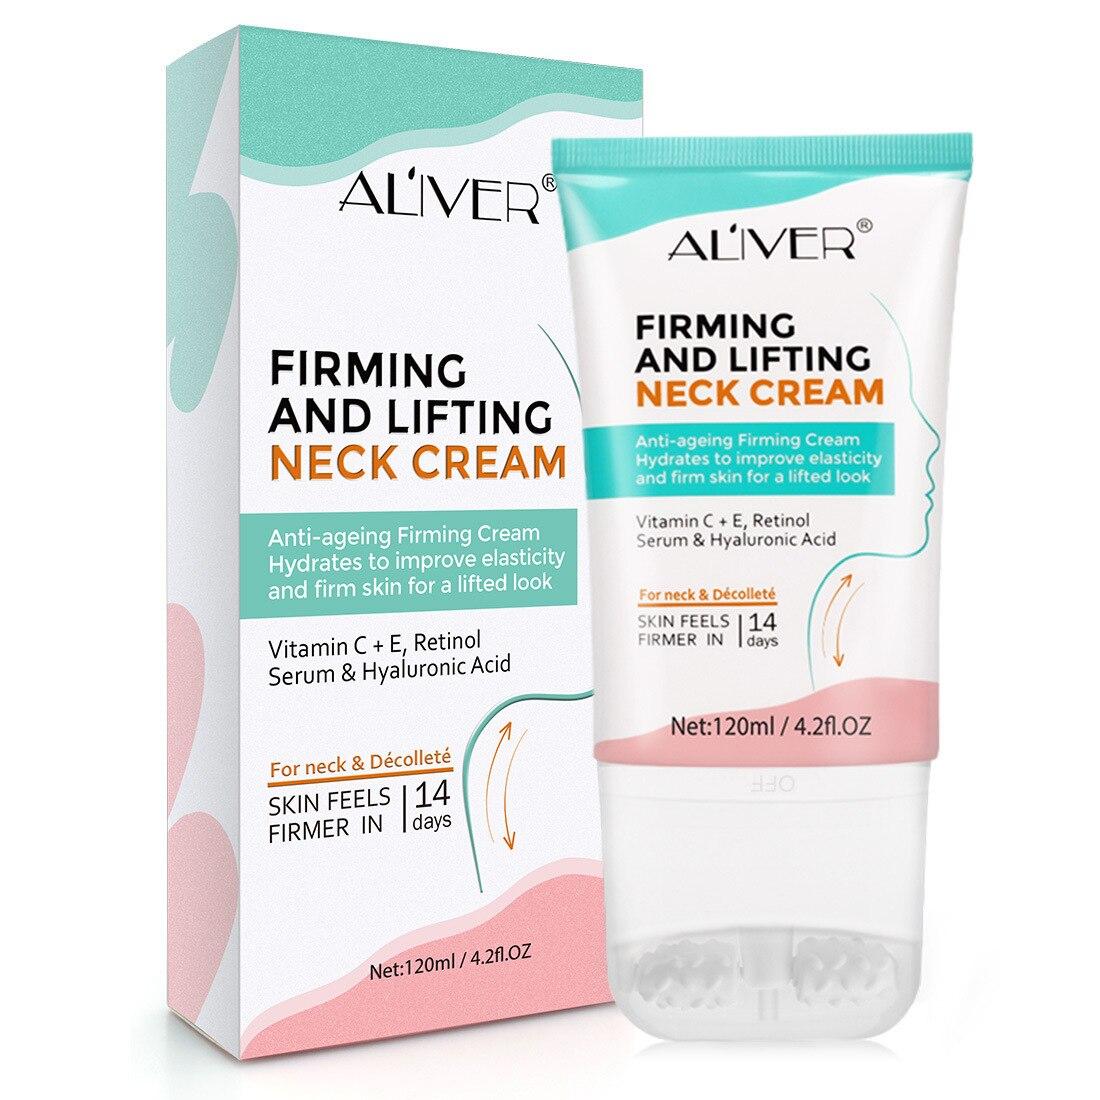 120g Firming Neck Cream V-Type Massager Neck Cream Skin Care Anti WrinkleFade Neckline Wrinkle Lifting Firming Neck Mask